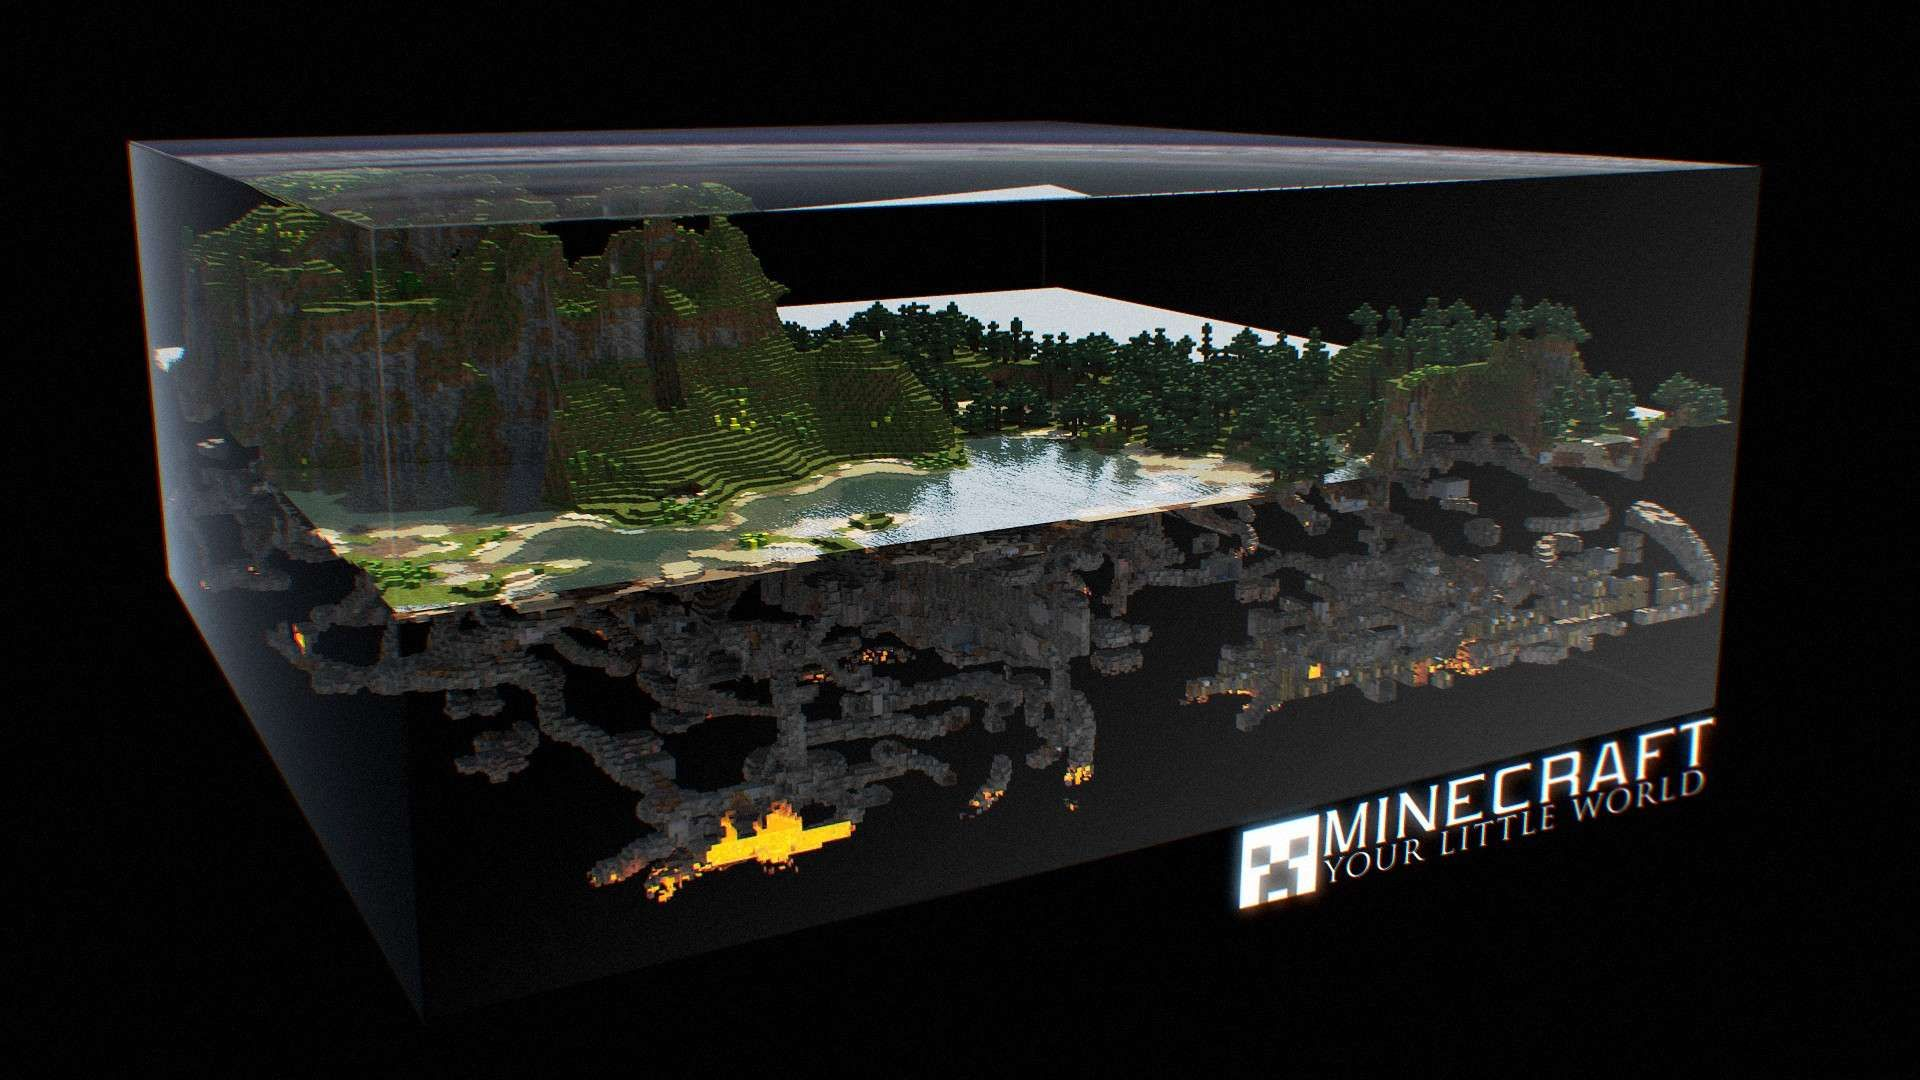 Great Wallpaper Minecraft Christmas - aa0d7a16c169f43f411aba1c2a61e088  Gallery_43596.jpg